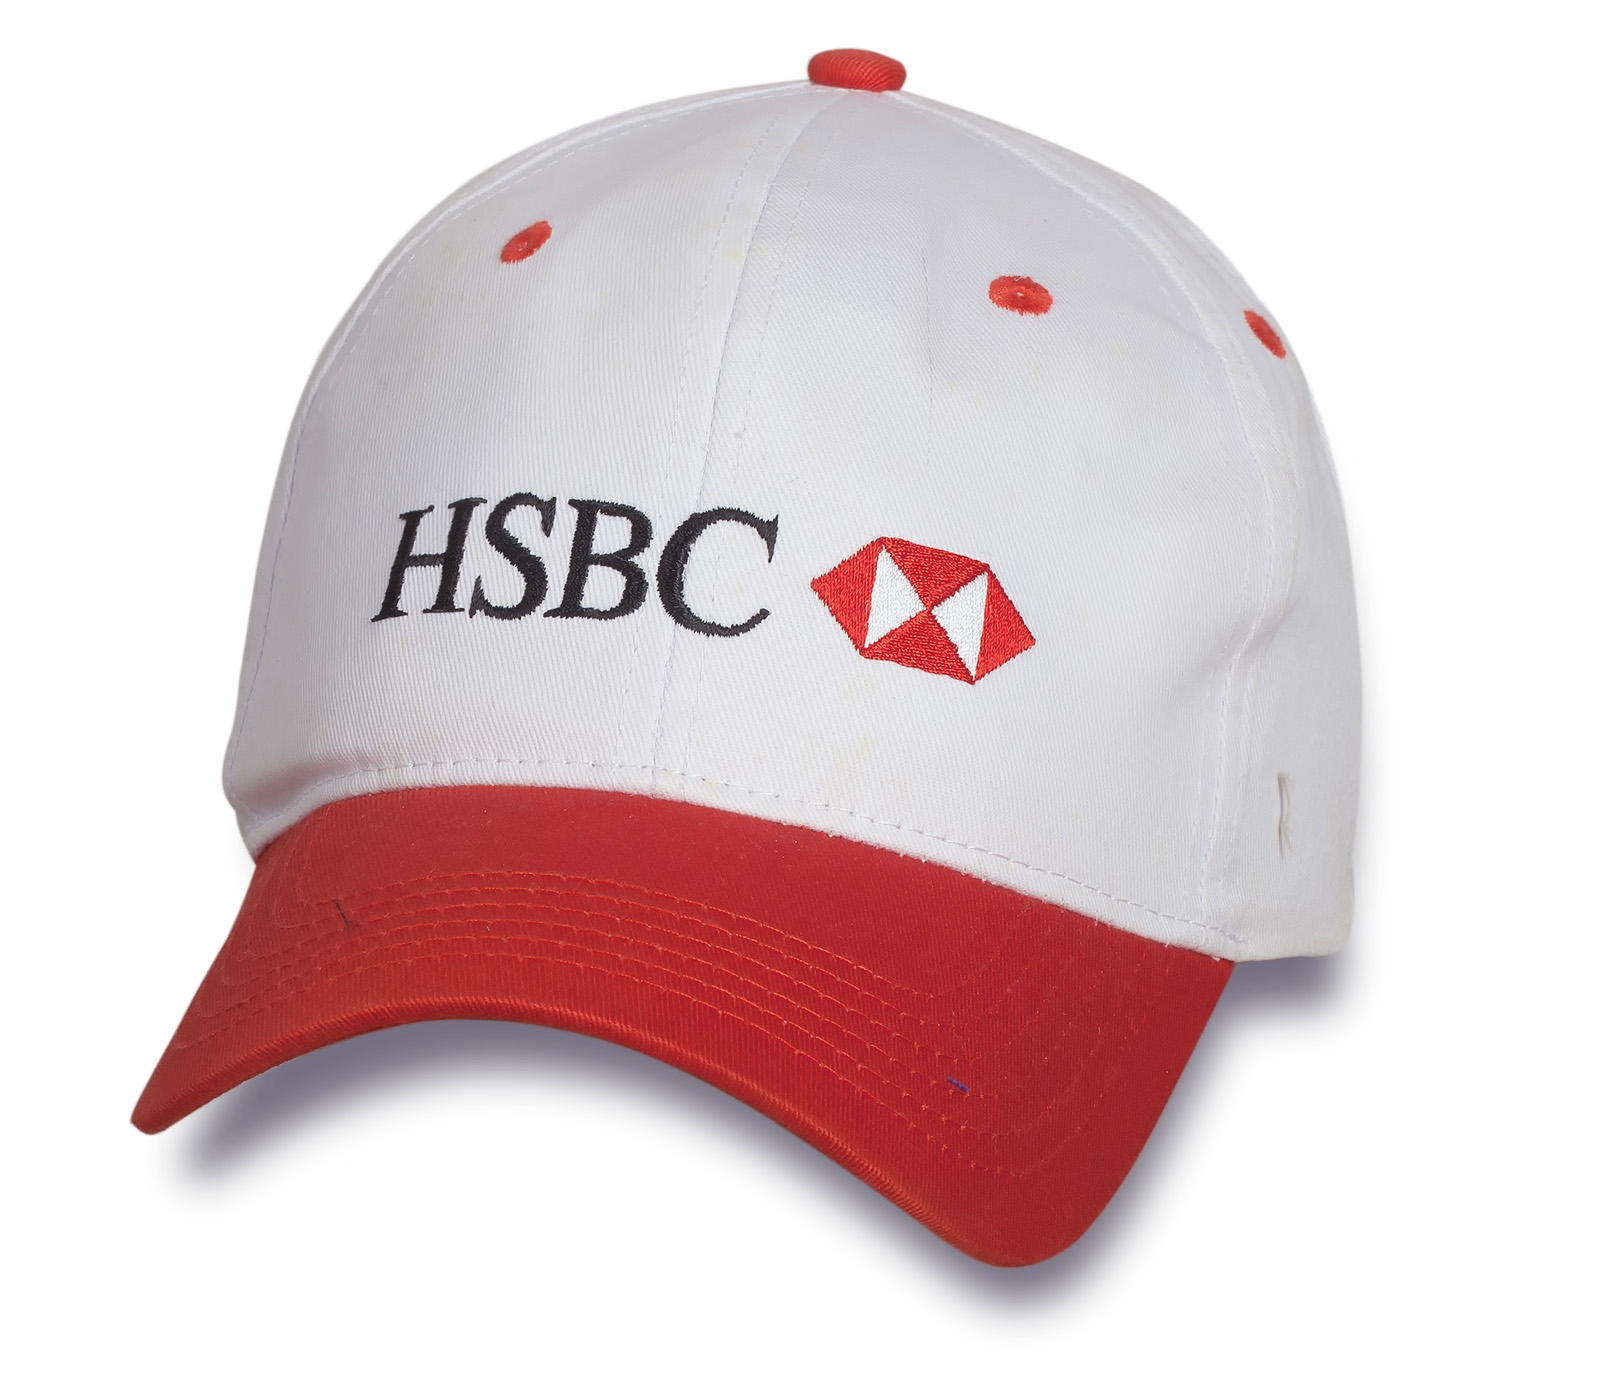 Крутая двухцветная бейсболка HSBC